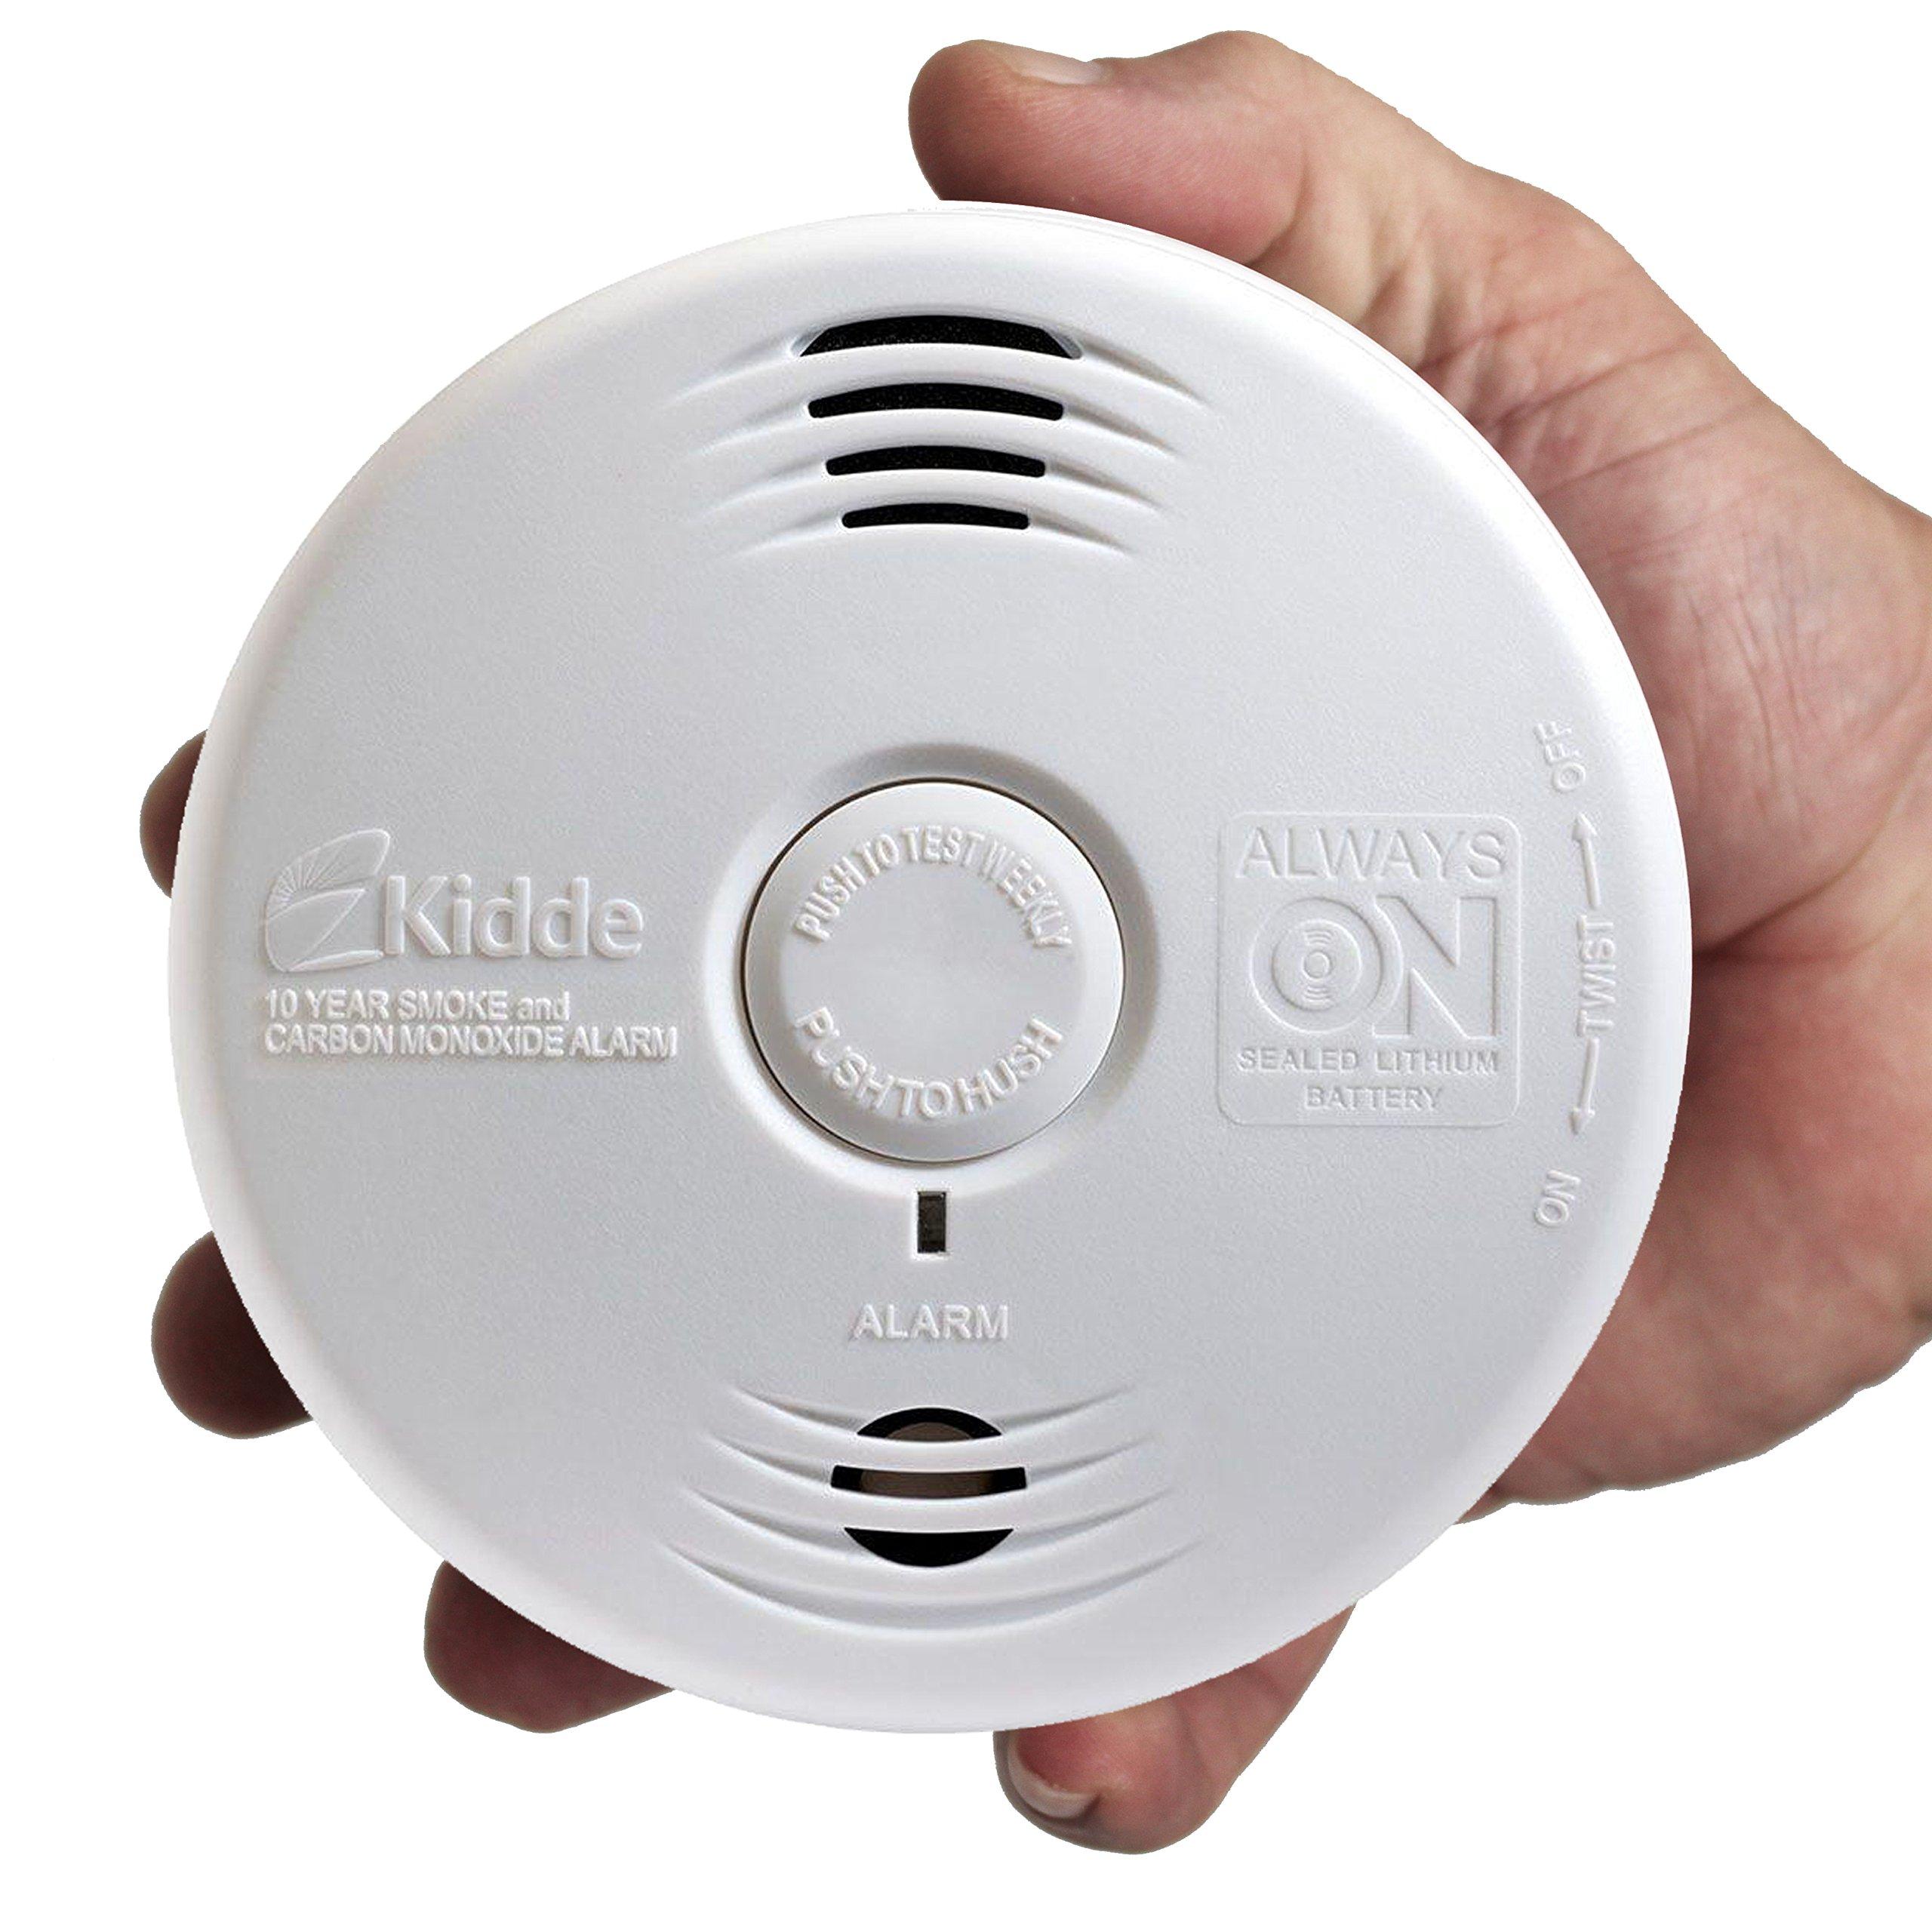 Worry-Free Hardwired Smoke & Carbon Monoxide Alarm with Lithium Battery Backup I12010SCO by Kidde (Image #11)